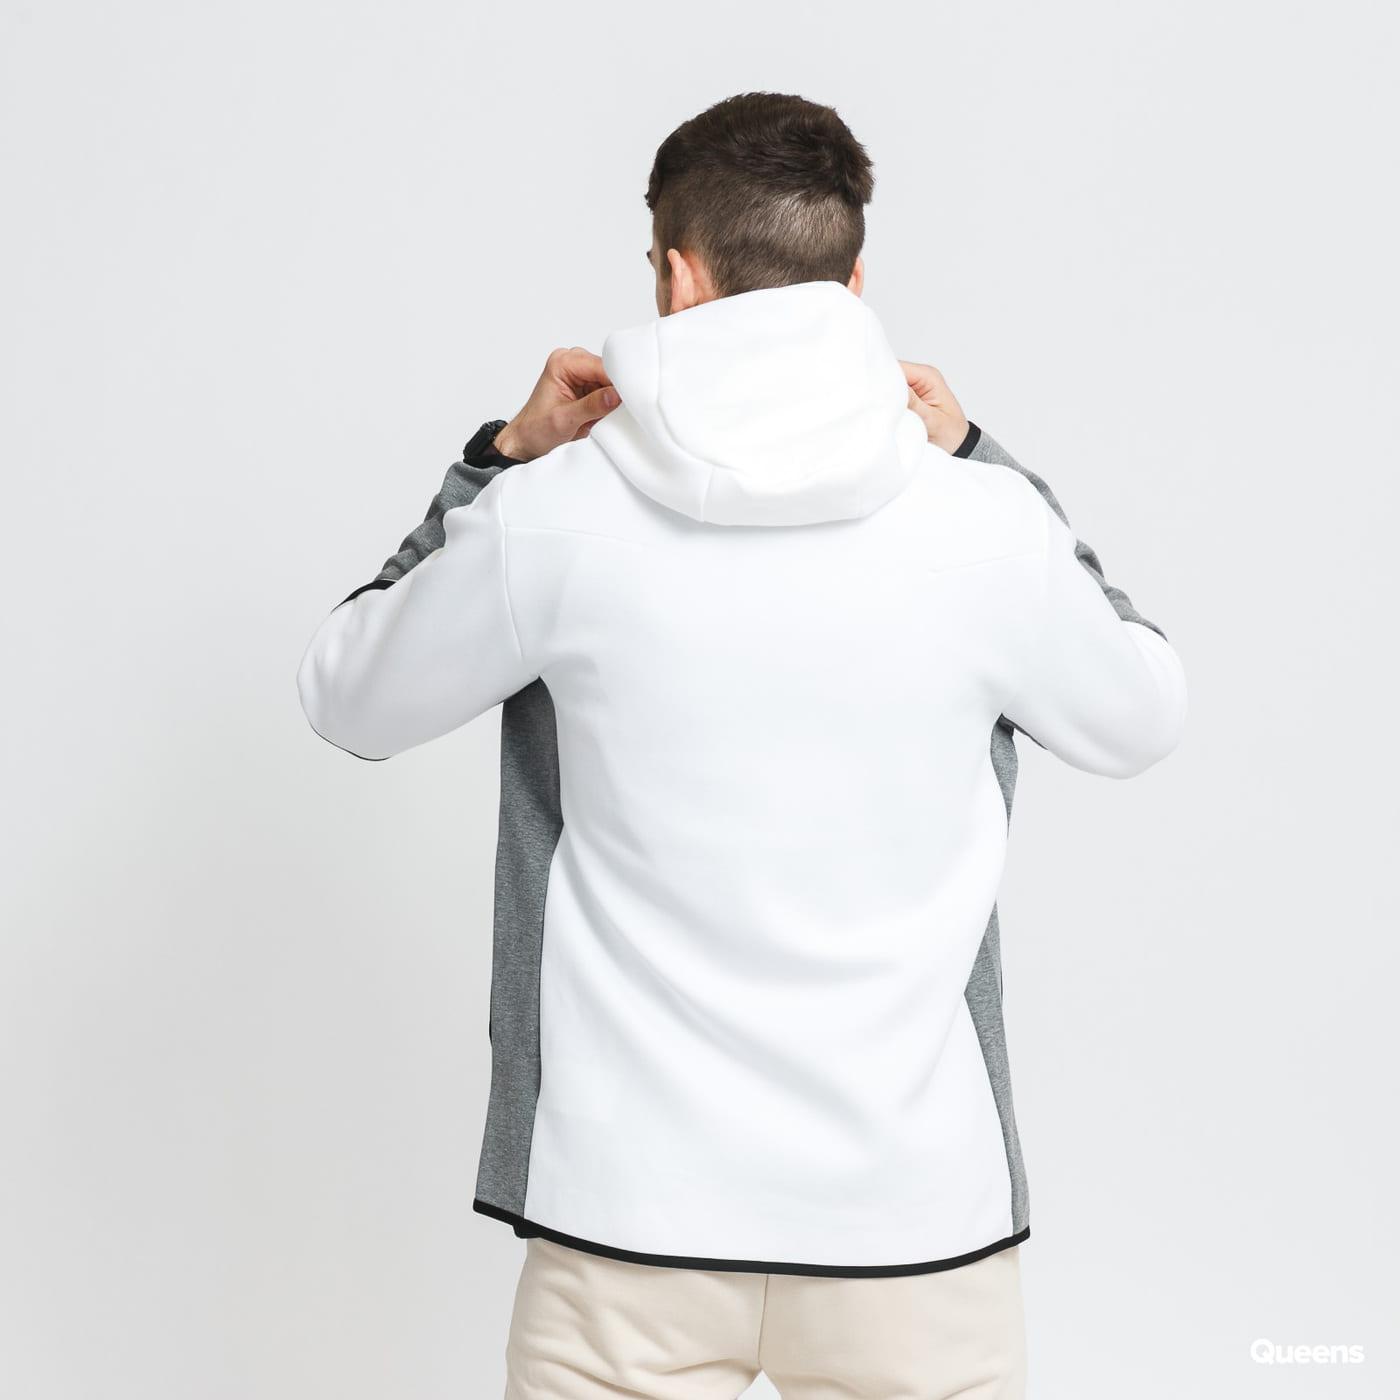 Nike M NSW Tech Fleece Hoodie FZ black / white / melange gray